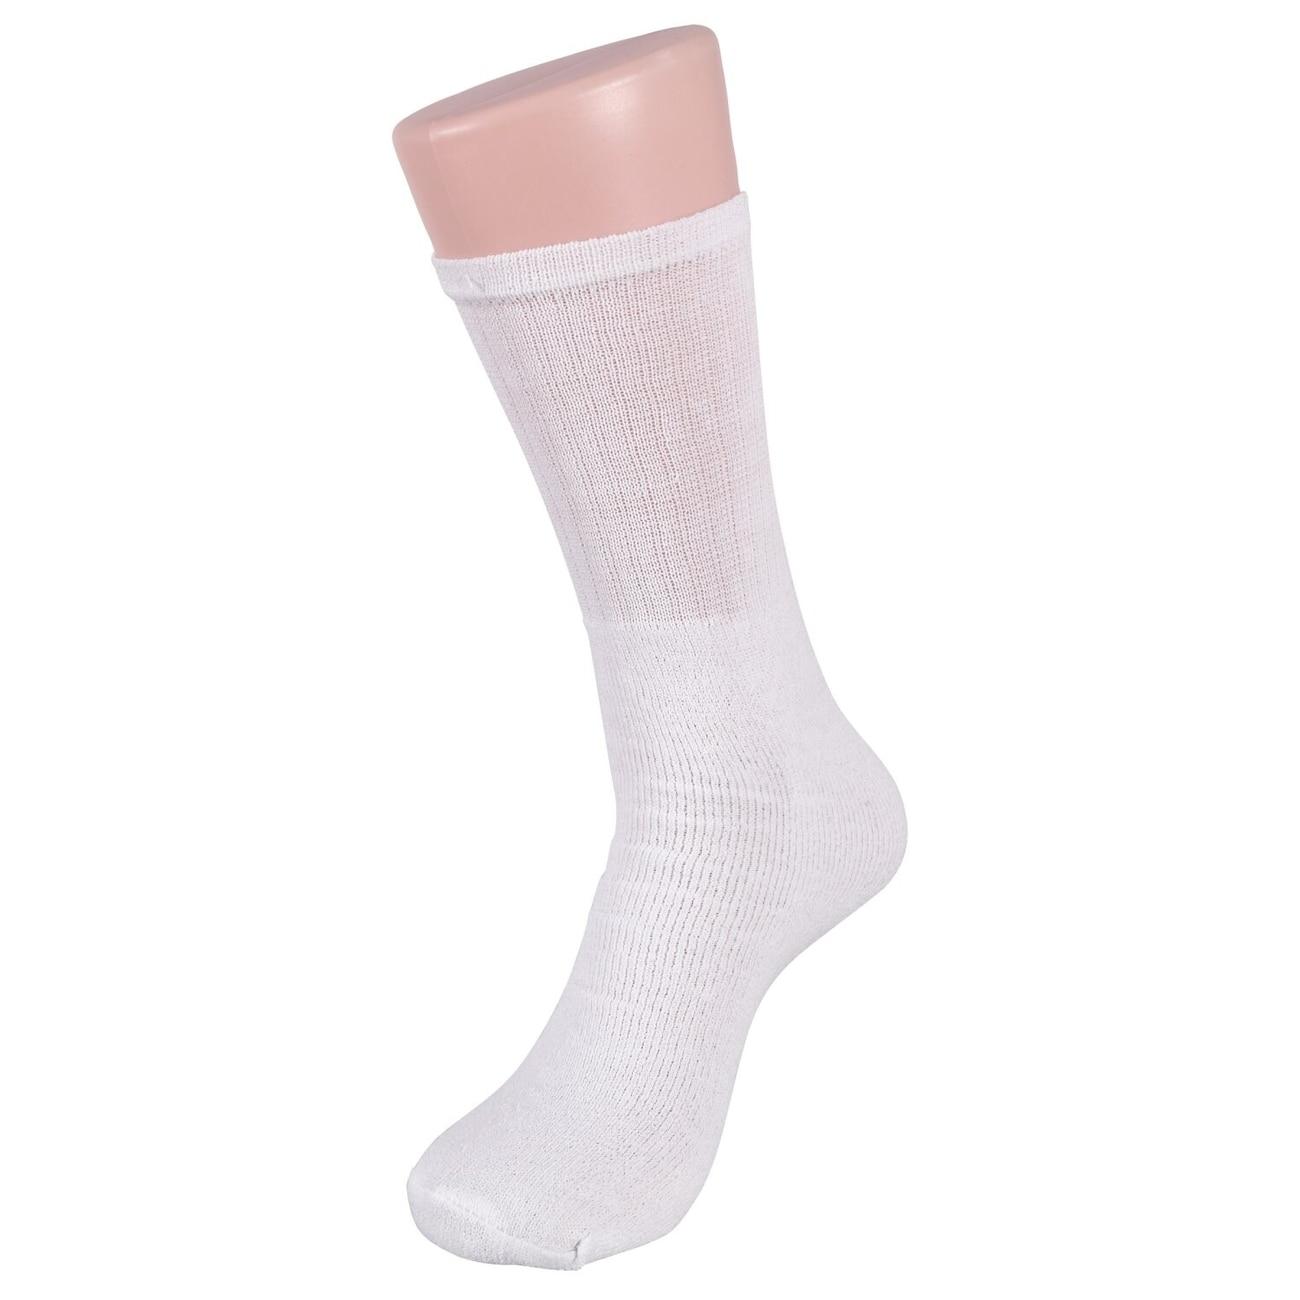 27bb34f42 Men s Premium Size 8-13 White Athletic Crew Socks